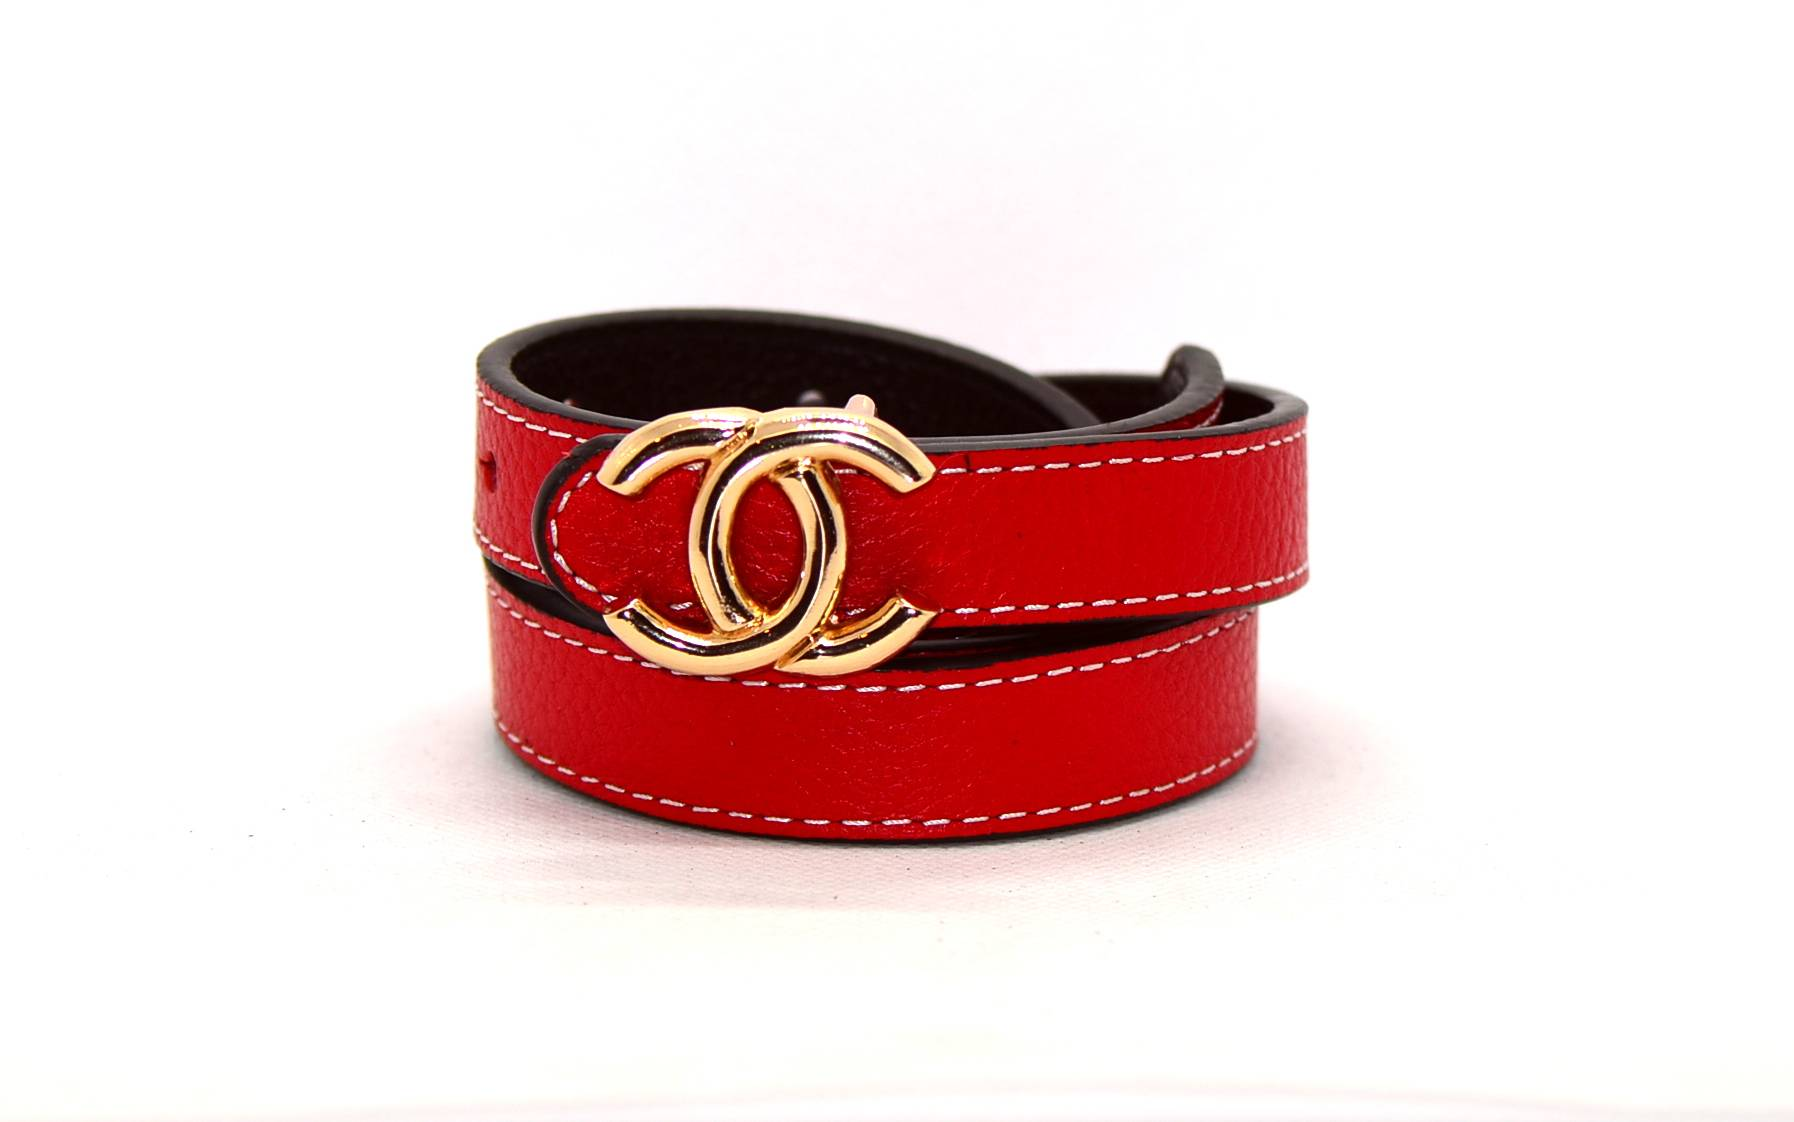 e02f77663d4b Женский ремень Chanel CH20W101 красный